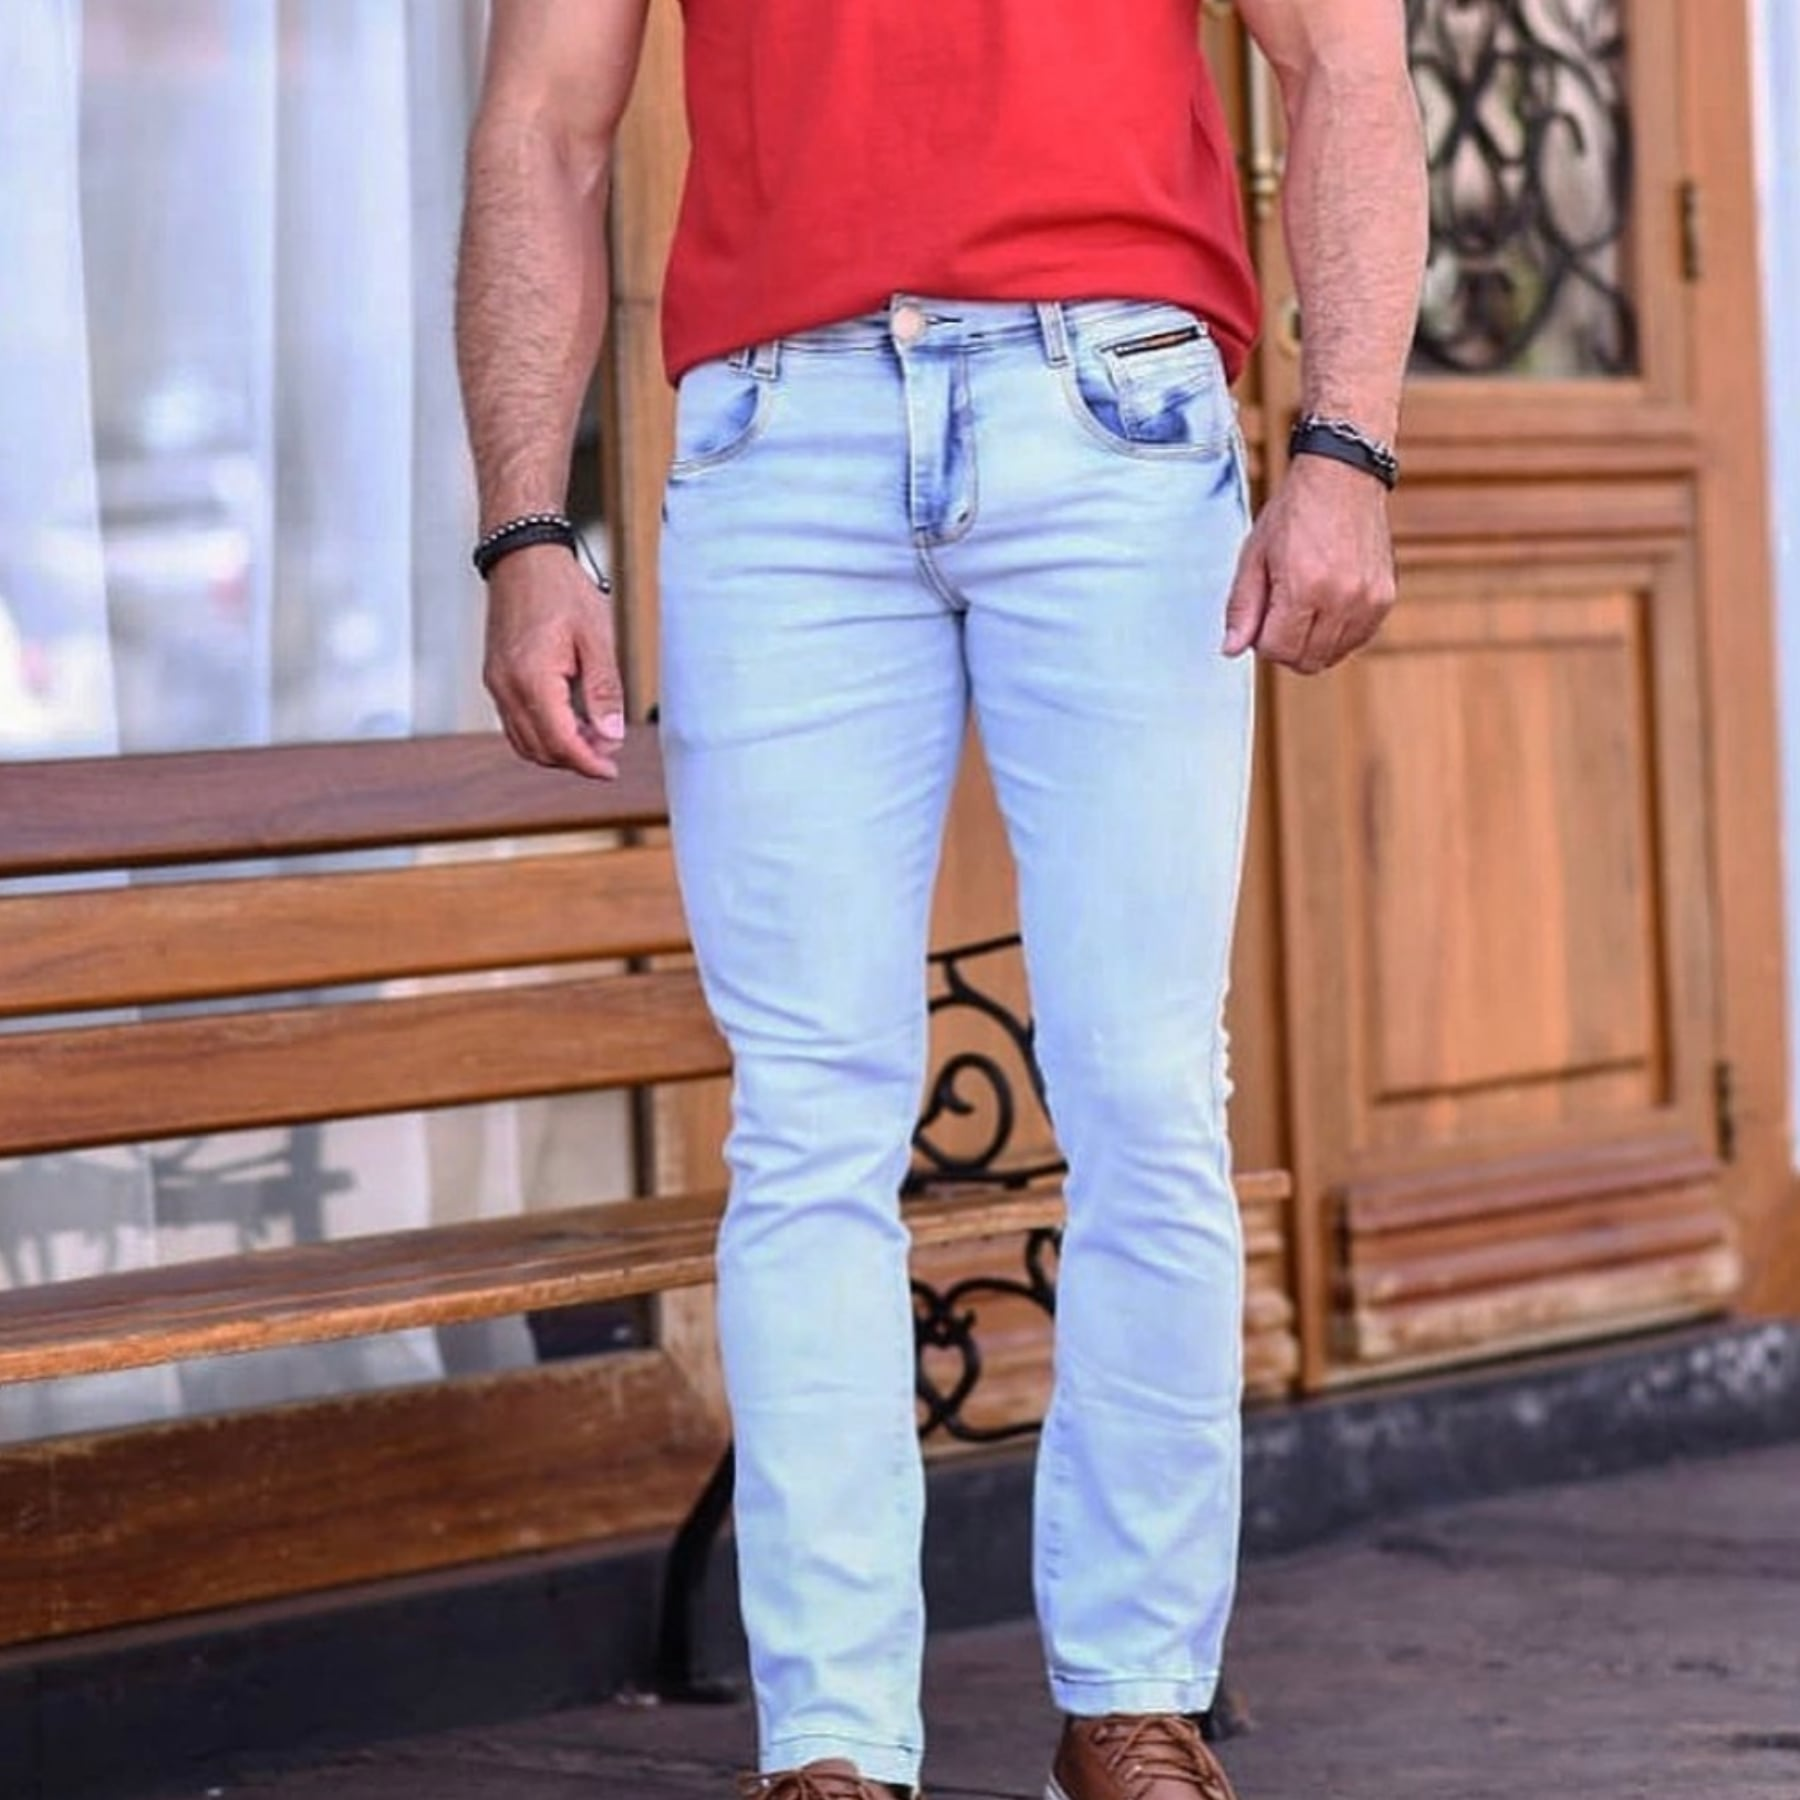 Calça Jeans Masculina Tradicional Claro Fenix Jeans